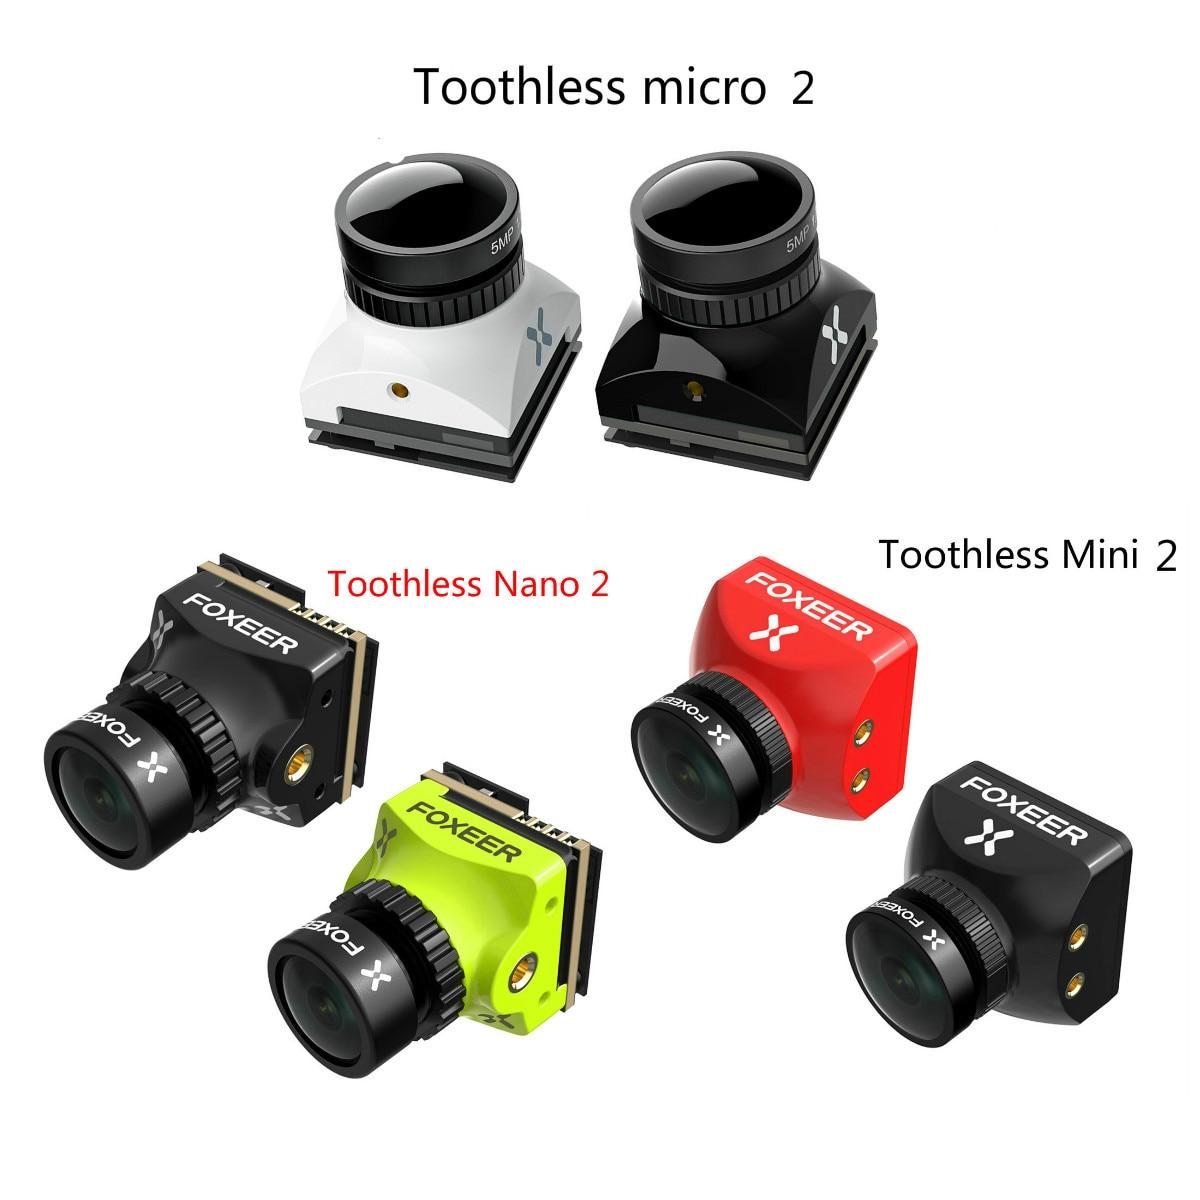 Foxeer Toothless Nano 2 Toothless mini/micro 1.7mm /1.8mm/2.1mm 1200TVL 1/2 CMOS FPV Camera HDR 1/2 CMOS Sensor For Racing Drone